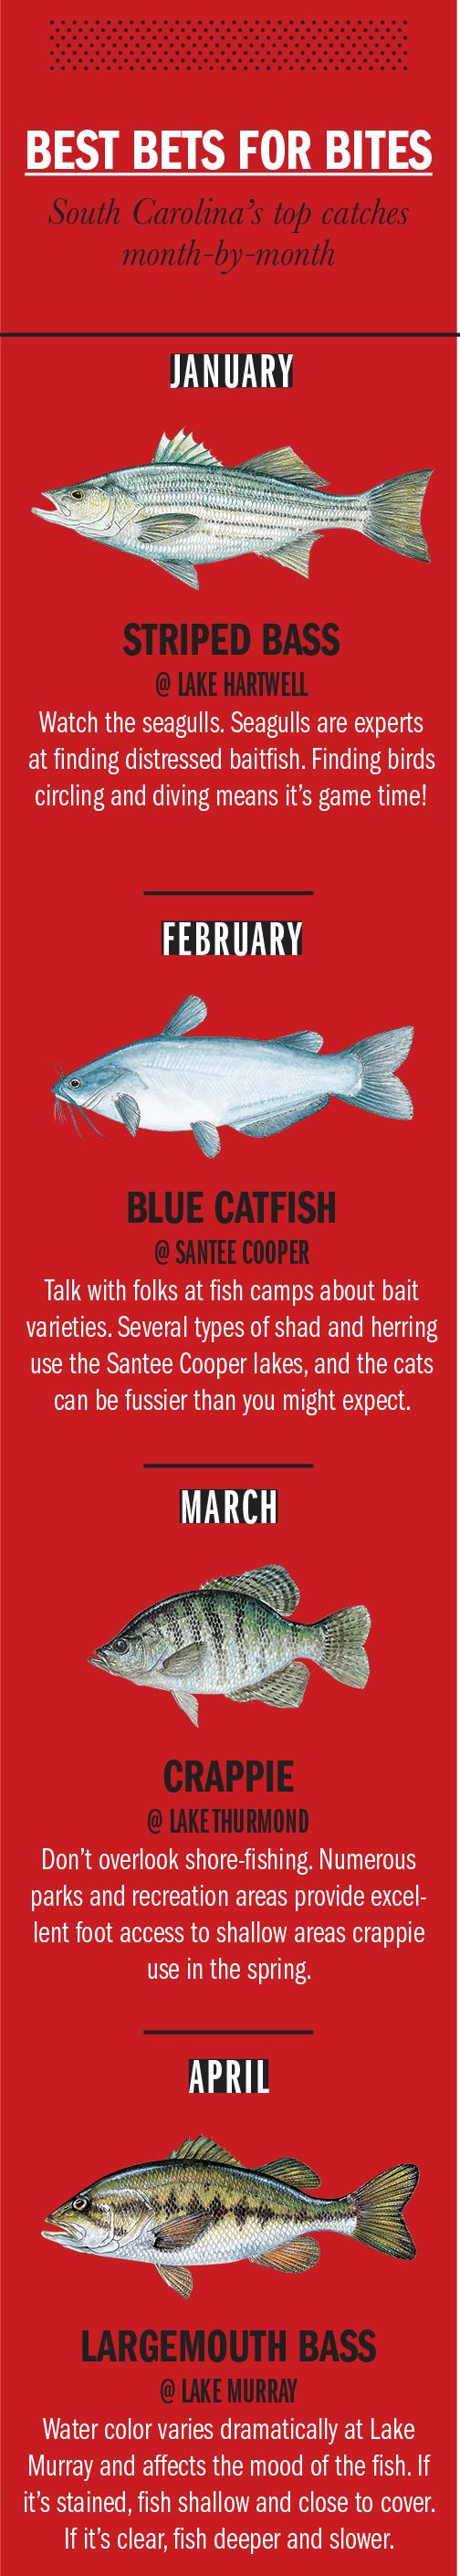 2018 South Carolina Fishing Calendar - Game & Fish